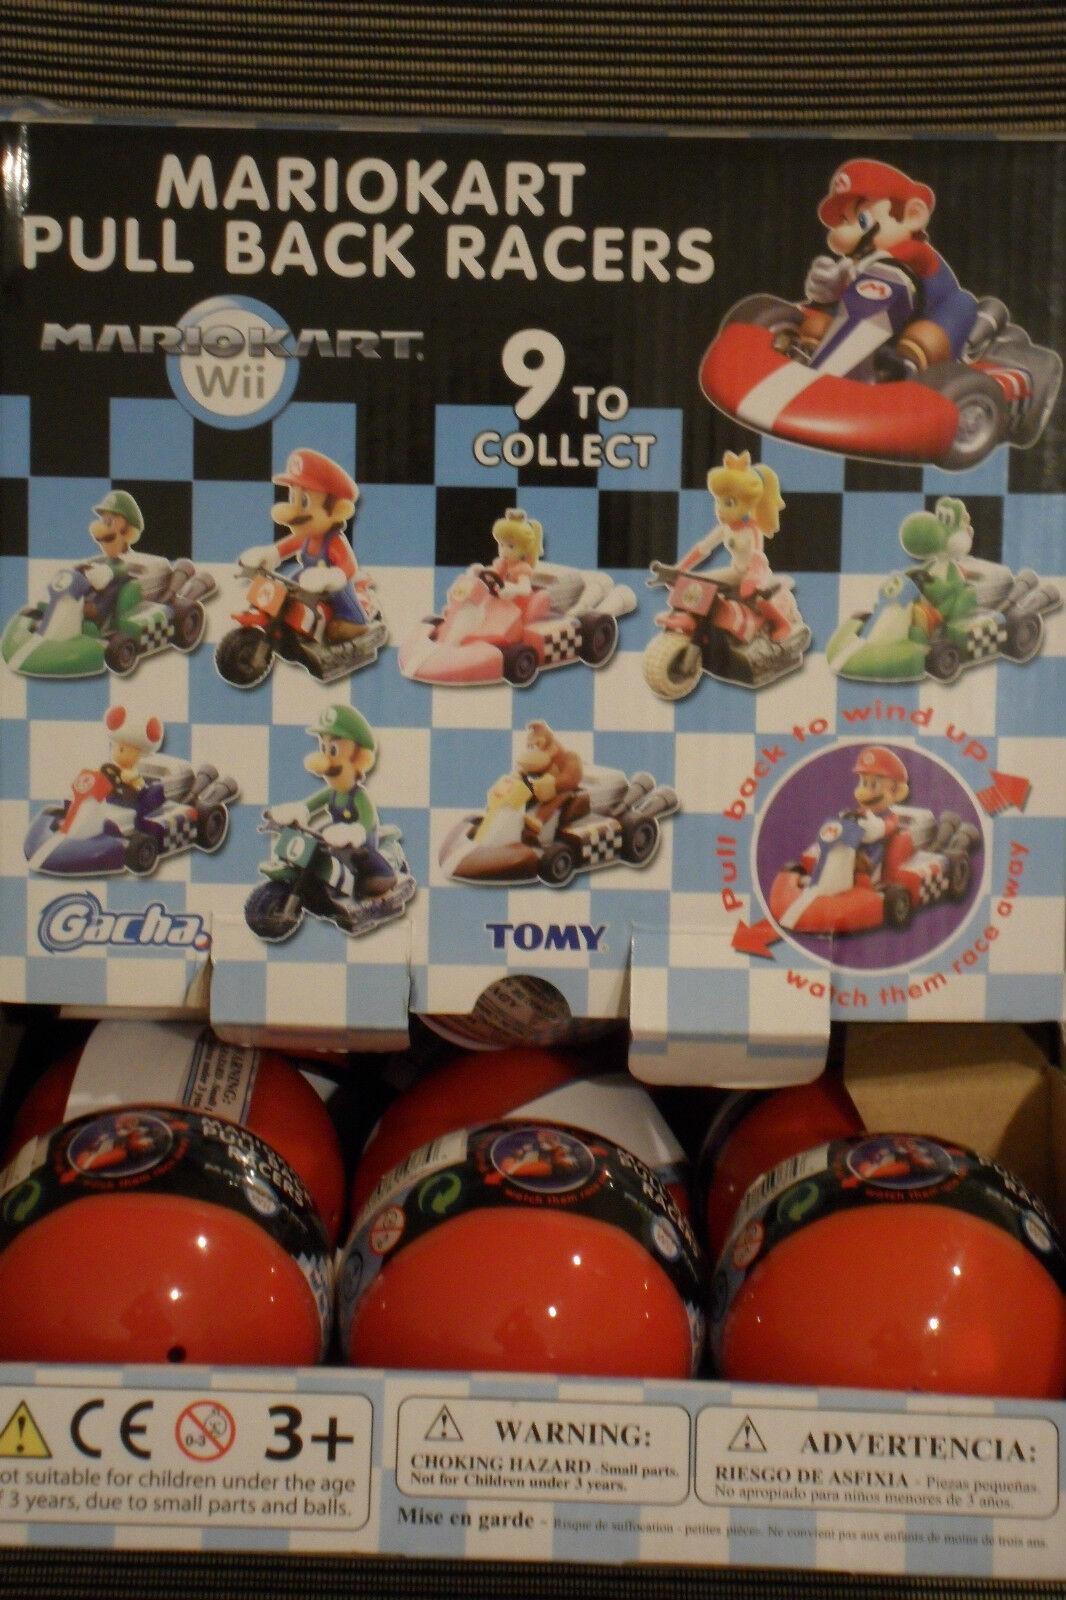 Nintendo Super Mario Bros. MarioKart Wii Pull Back Racers 1 Random